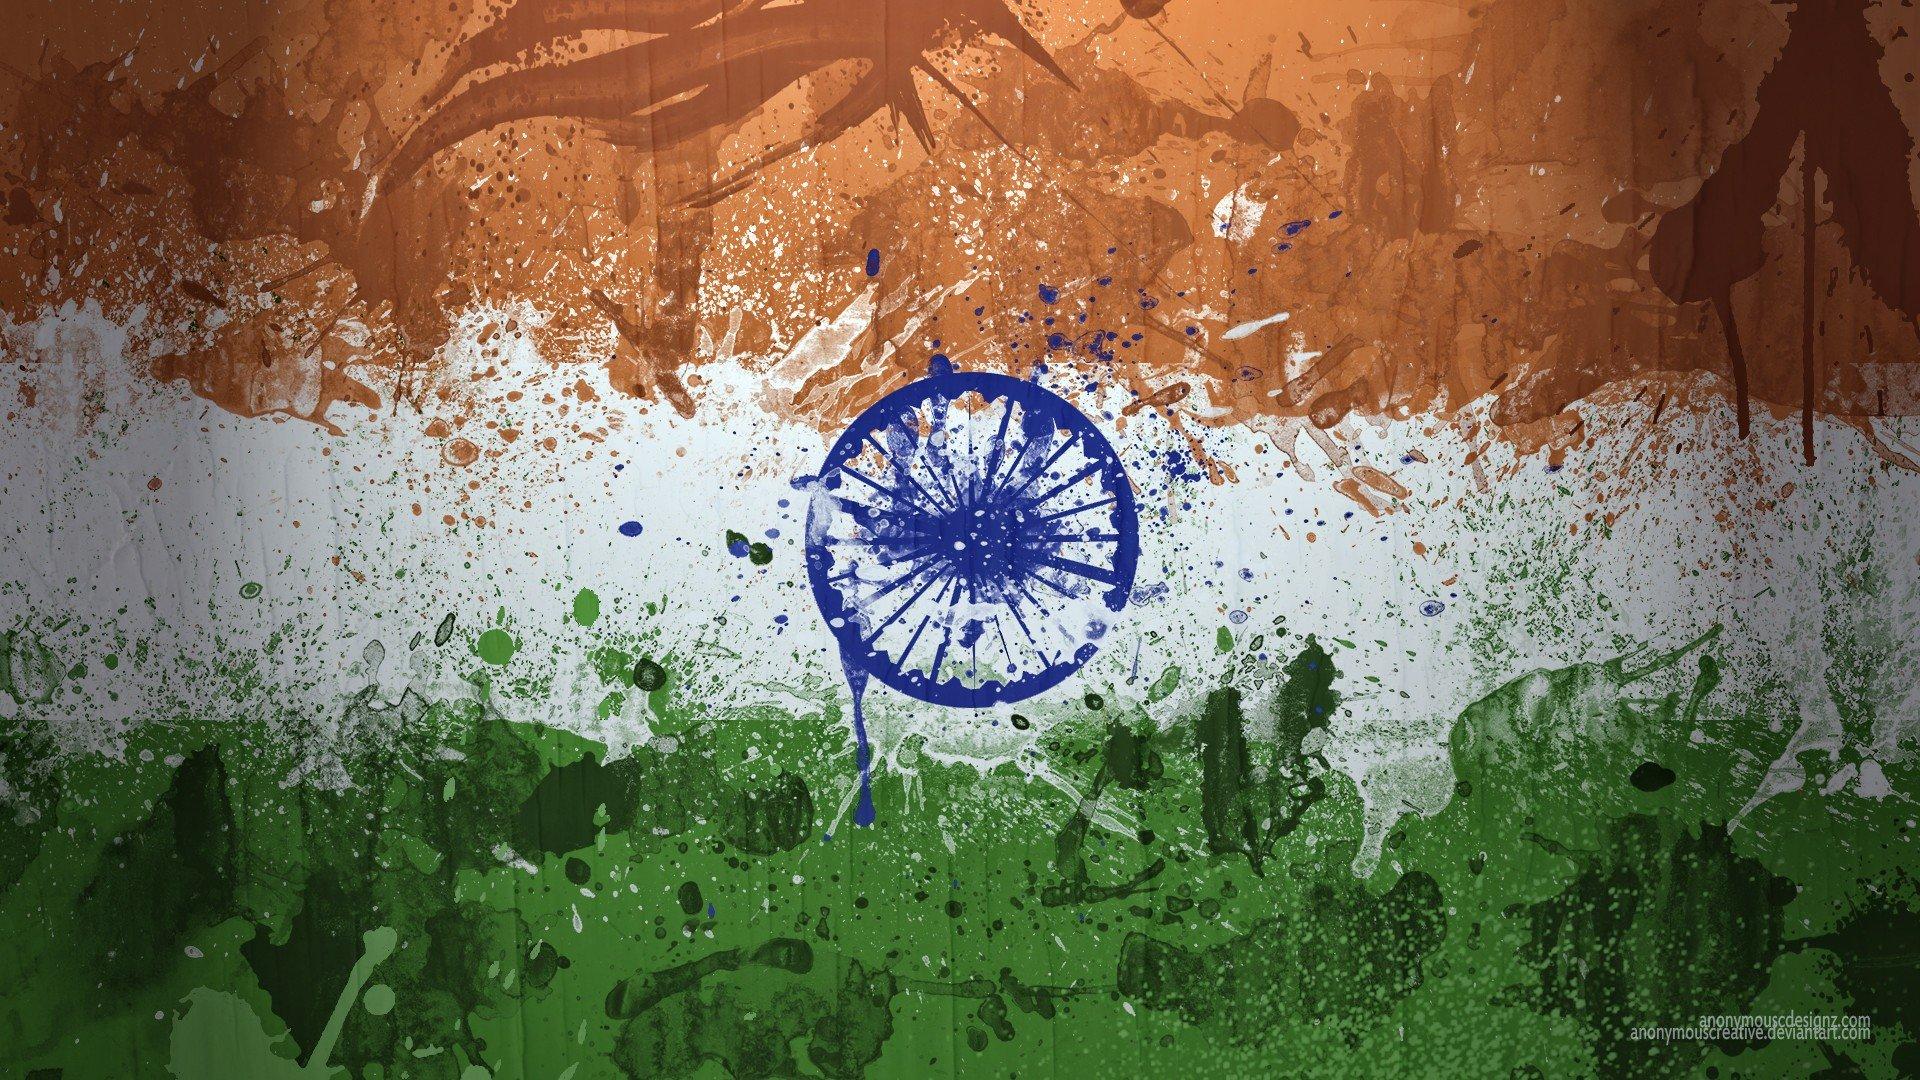 India Flag Hd 1920 1080: Wallpaper : 1920x1080 Px, Flag, India 1920x1080